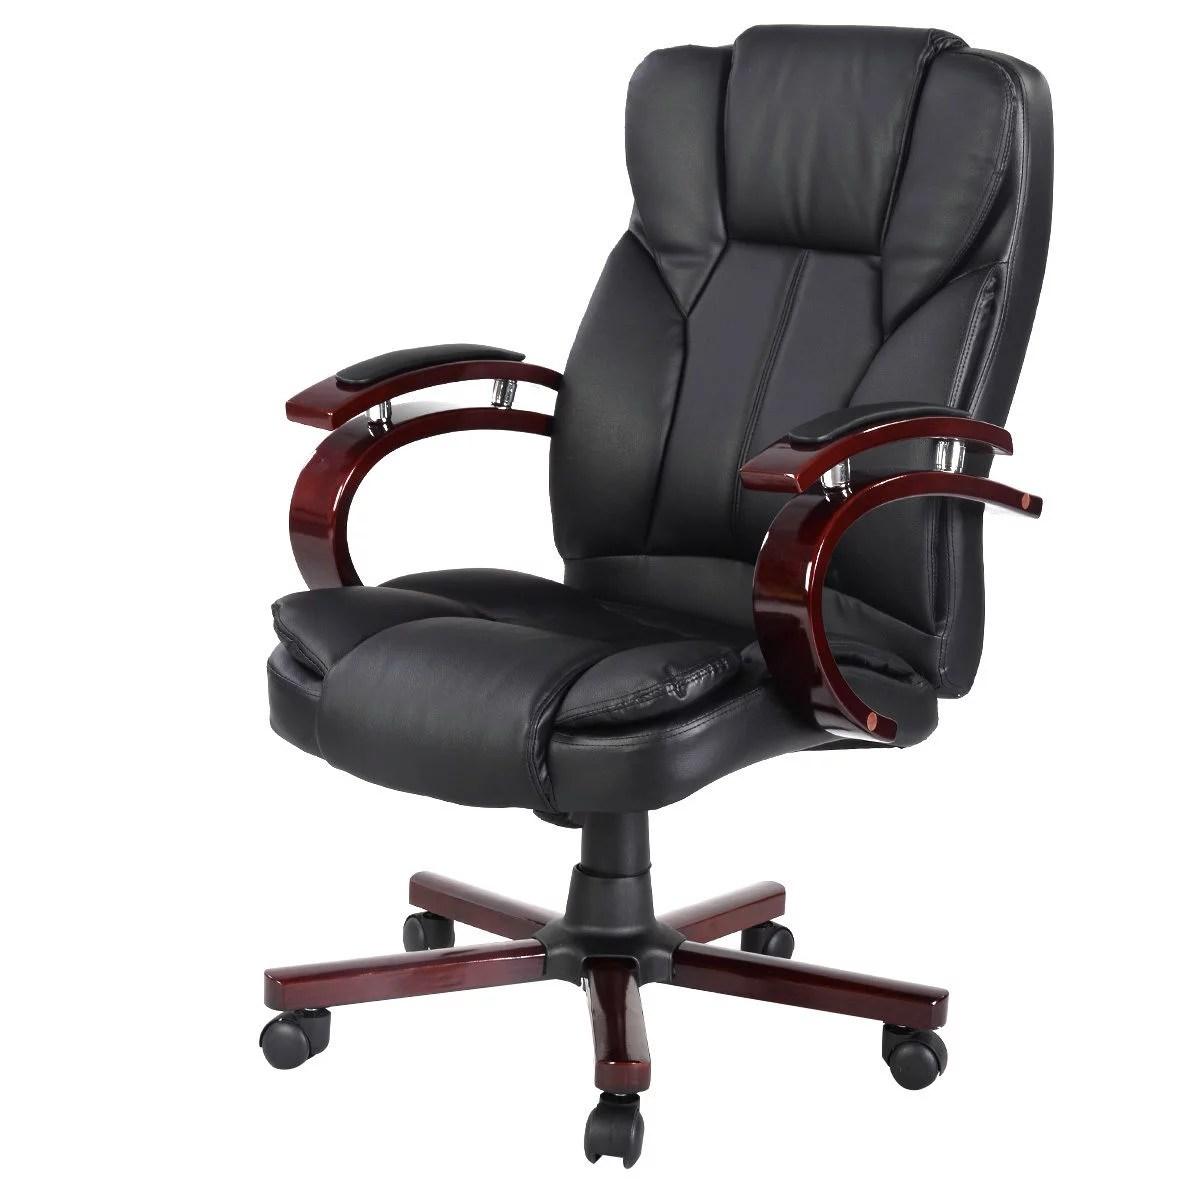 office chair high back wedding covers hire huddersfield costway ergonomic desk task executive computer new style walmart com